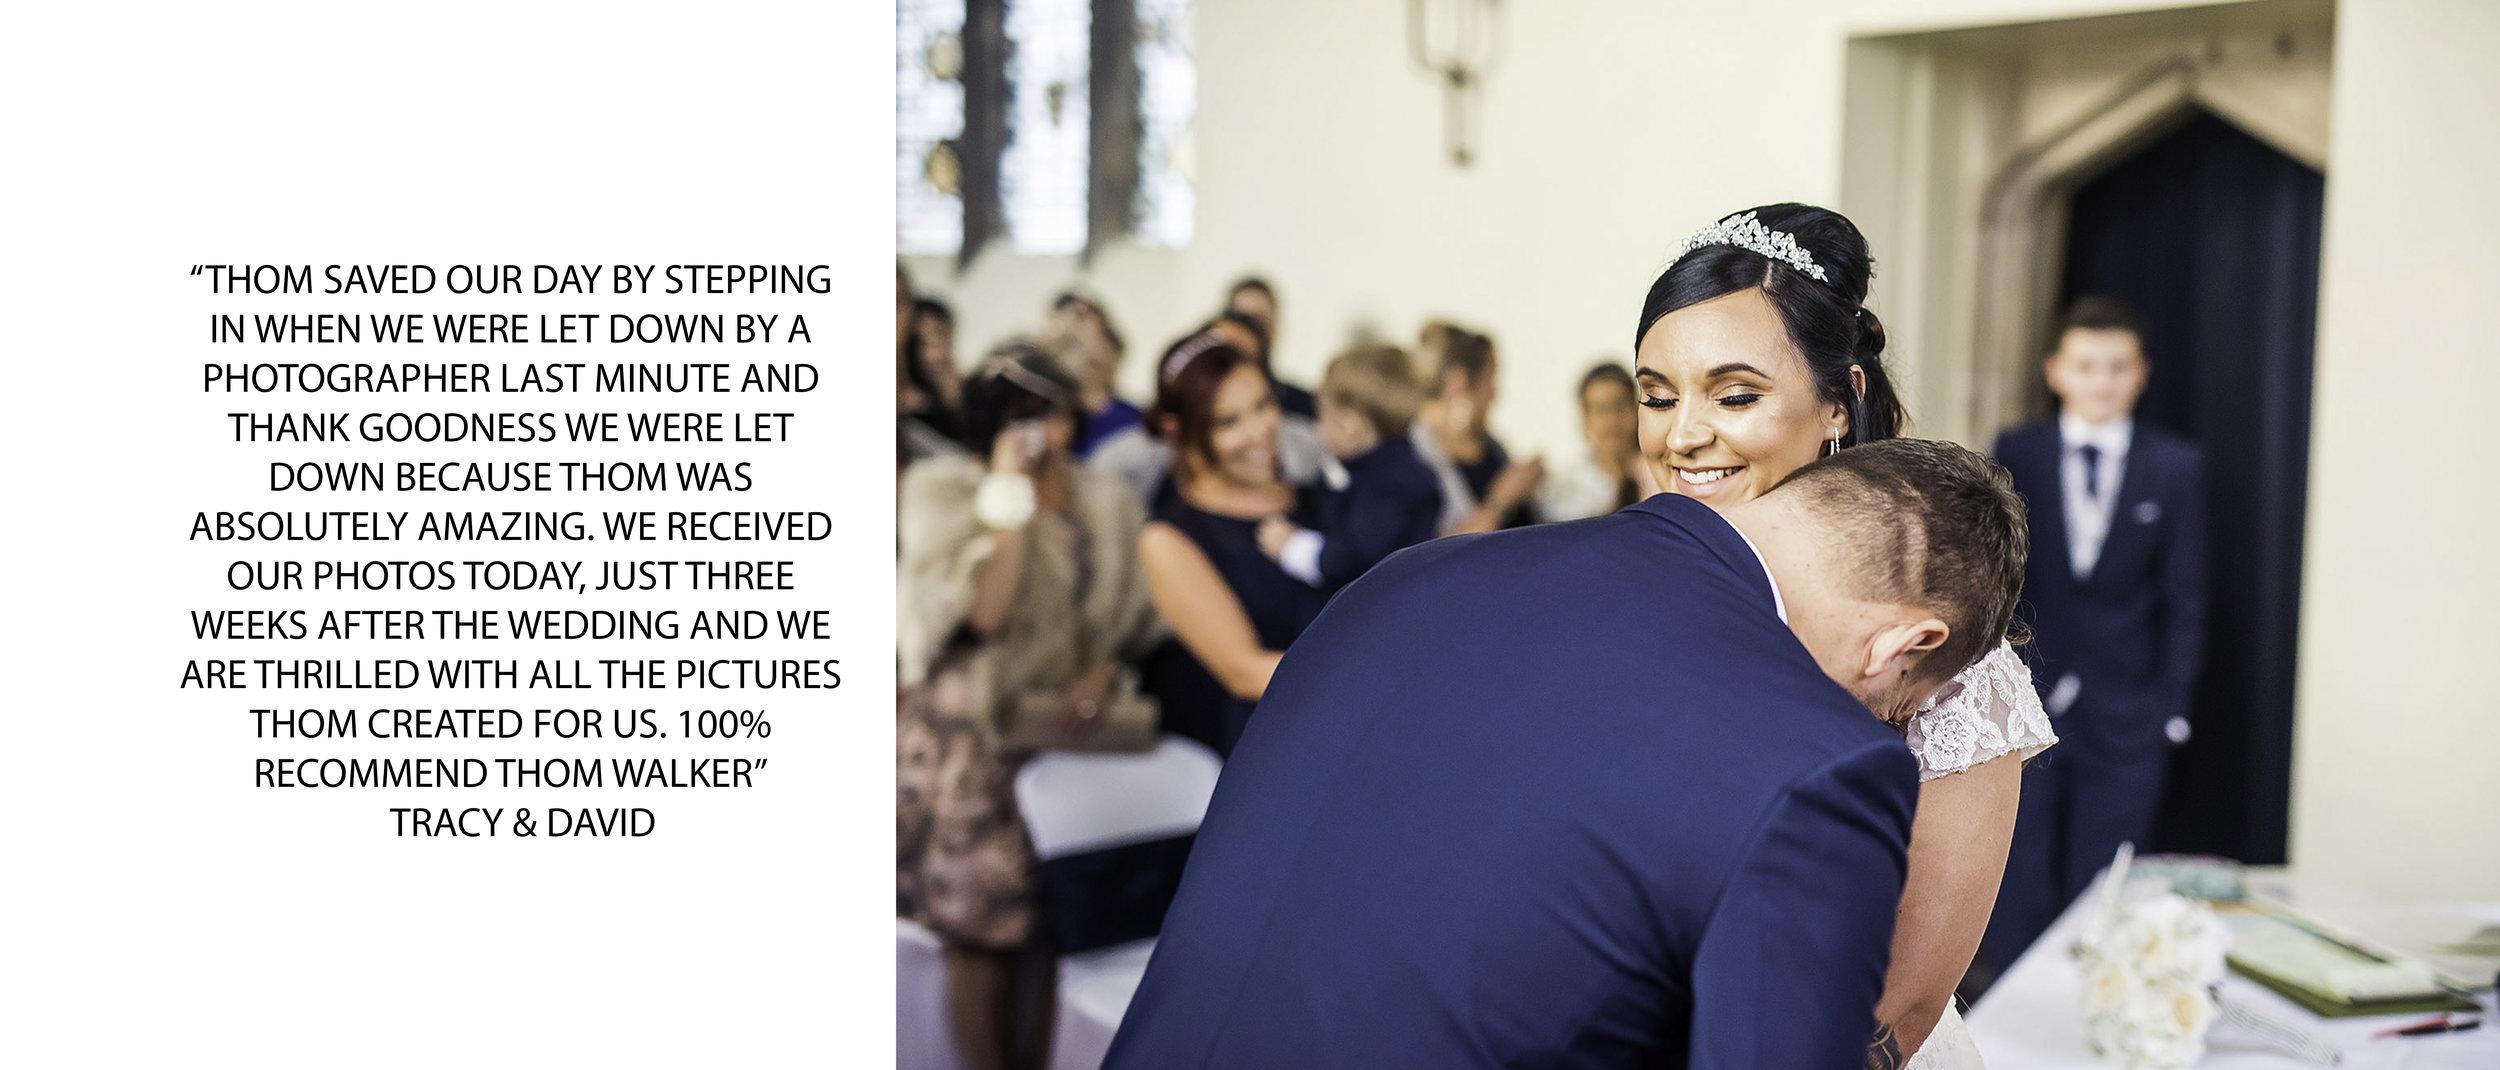 Nottingham wedding photographer review4.jpg